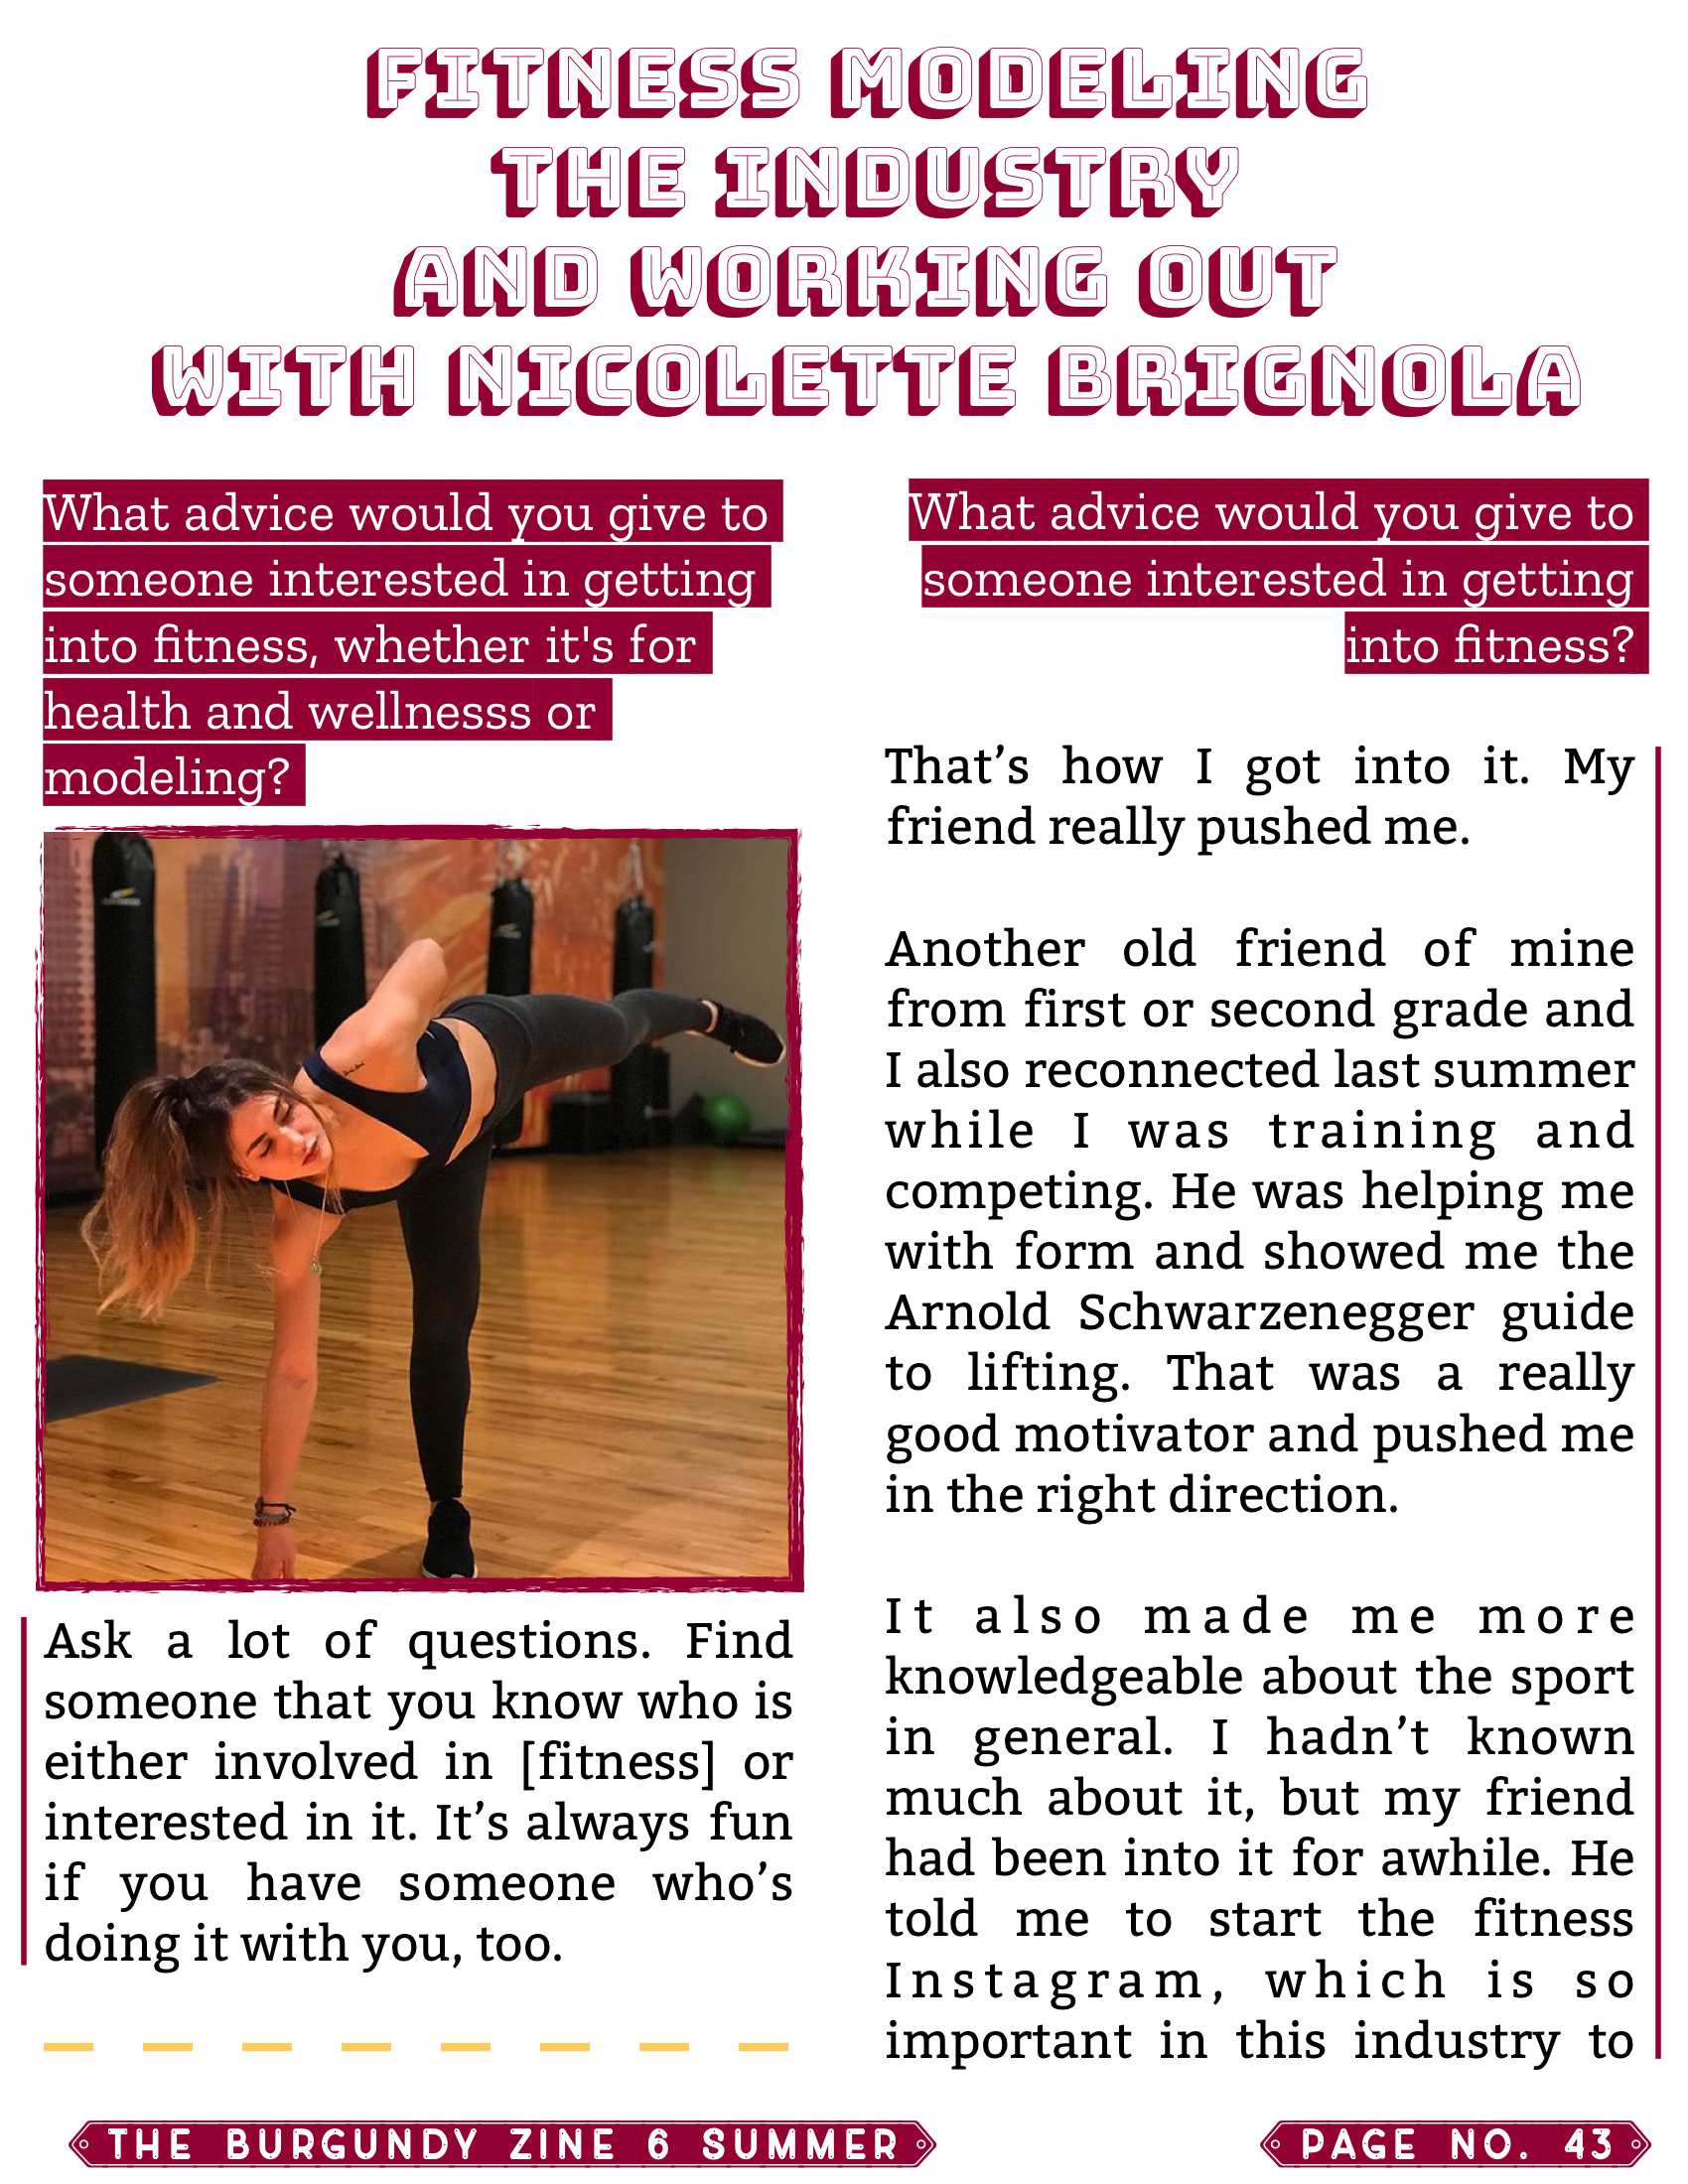 The Burgundy Zine #6: Summer Pg. 43